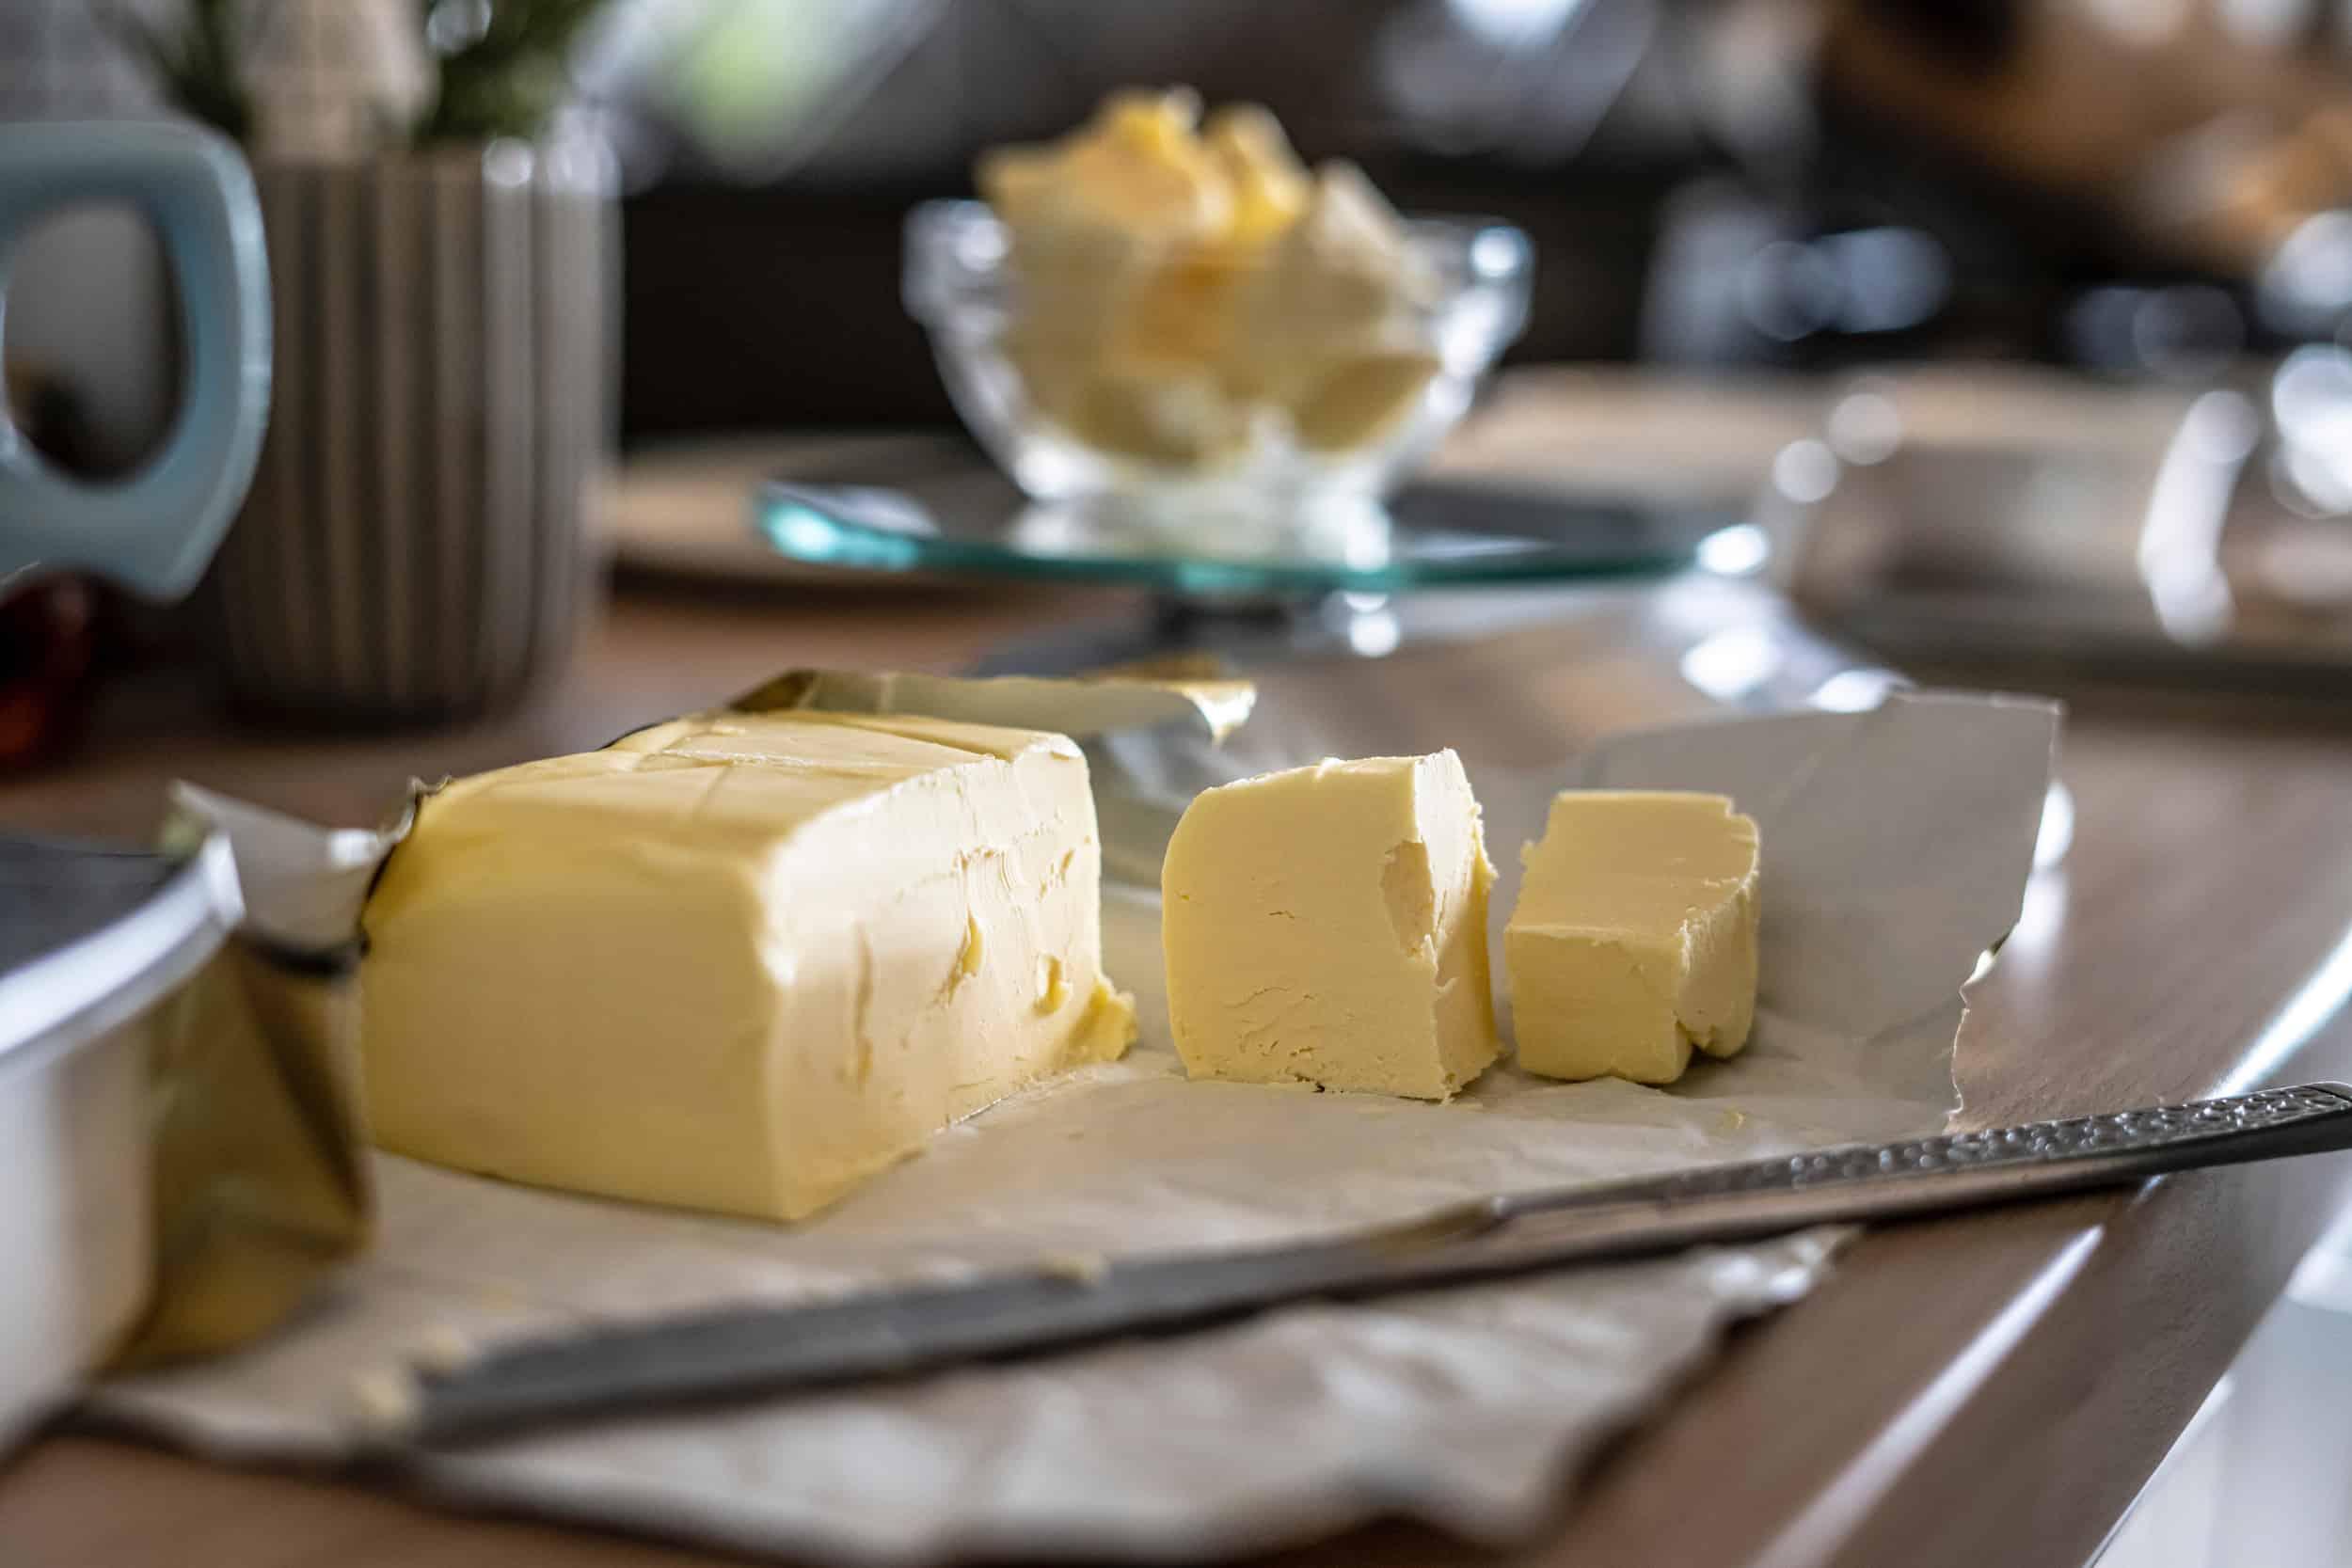 Butter recipe | Photo: Photo by Sorin Gheorghita on Unsplash